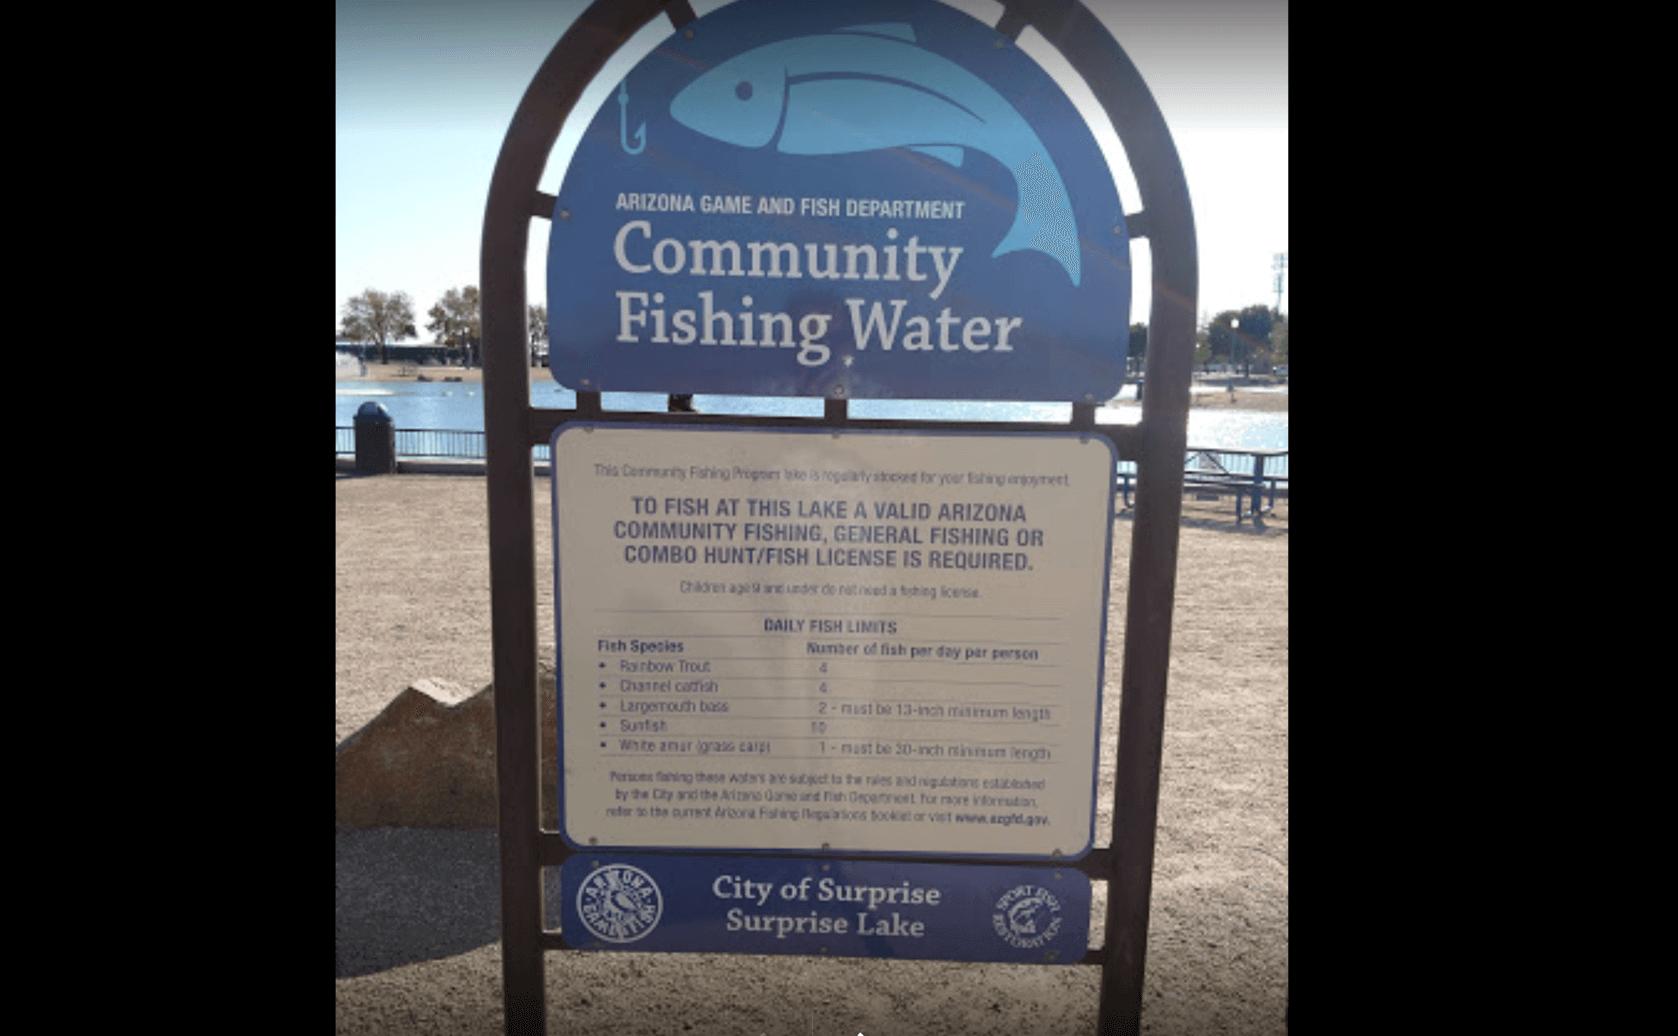 Surprise-Community-Lake-Fishing-Guide-Peoria-AZ-02